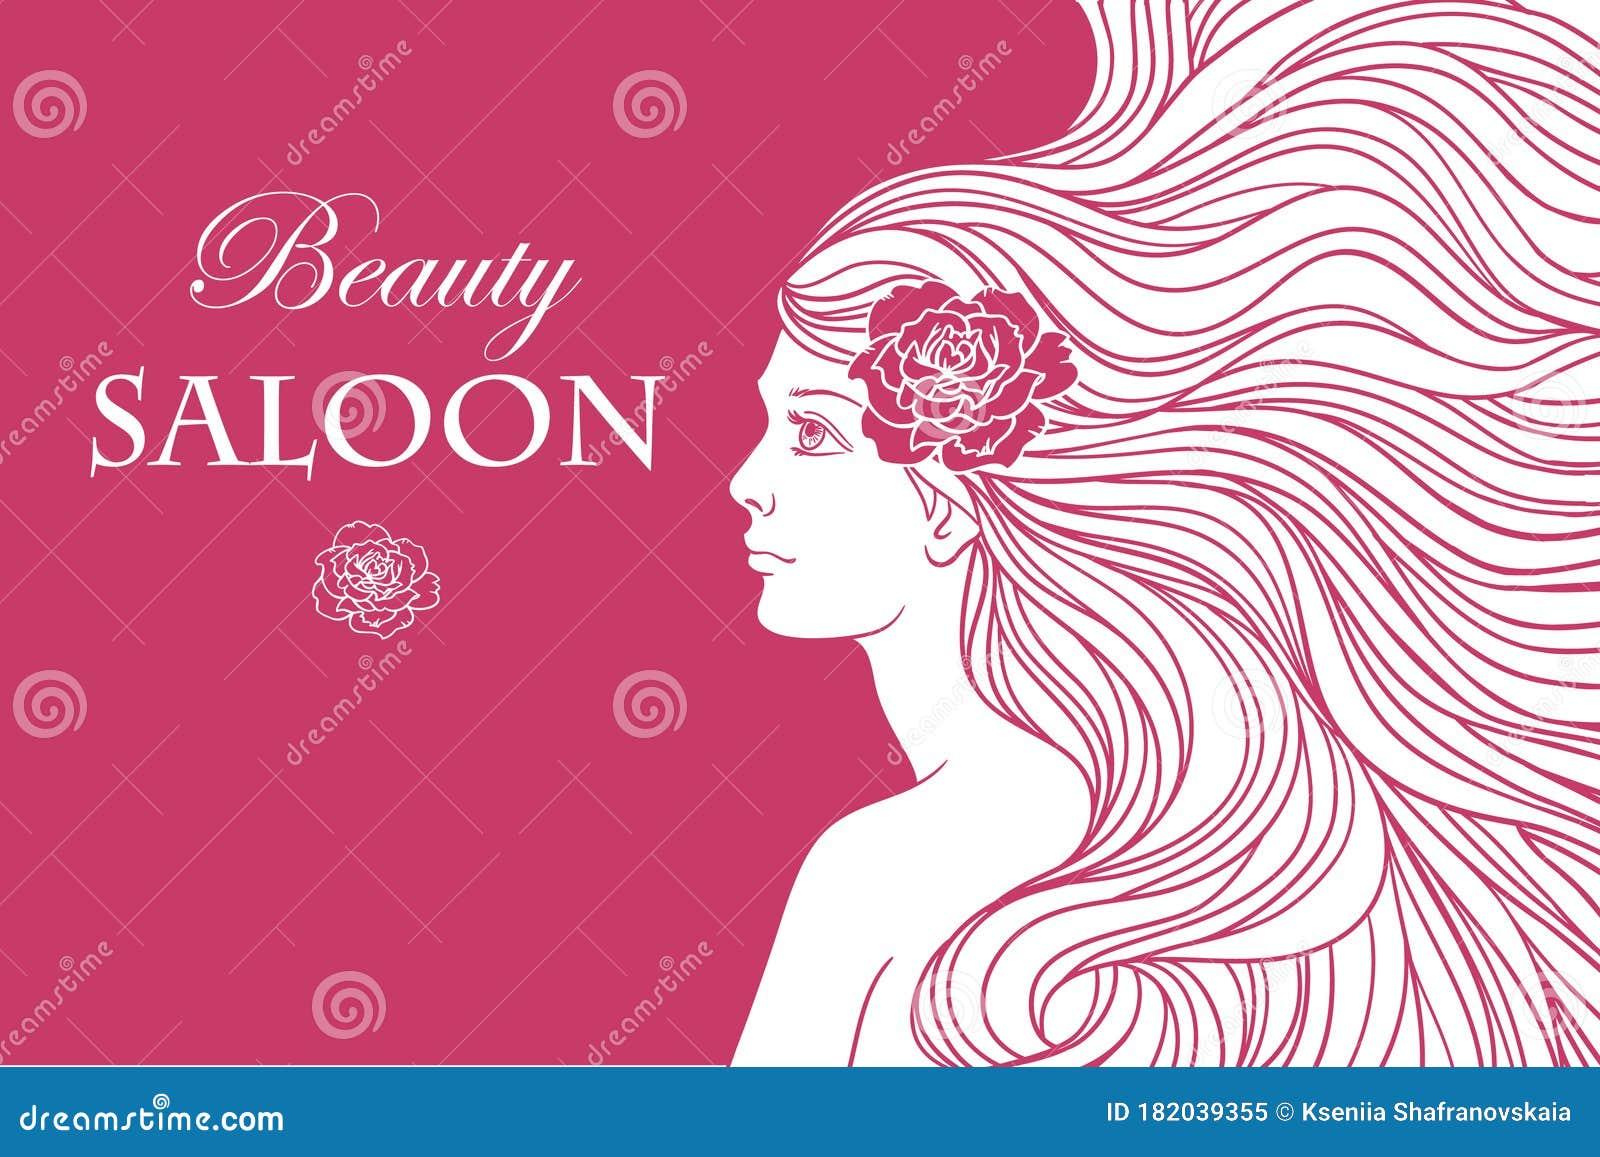 Hair Background Beauty Salon Poster Stock Illustrations 2 182 Hair Background Beauty Salon Poster Stock Illustrations Vectors Clipart Dreamstime